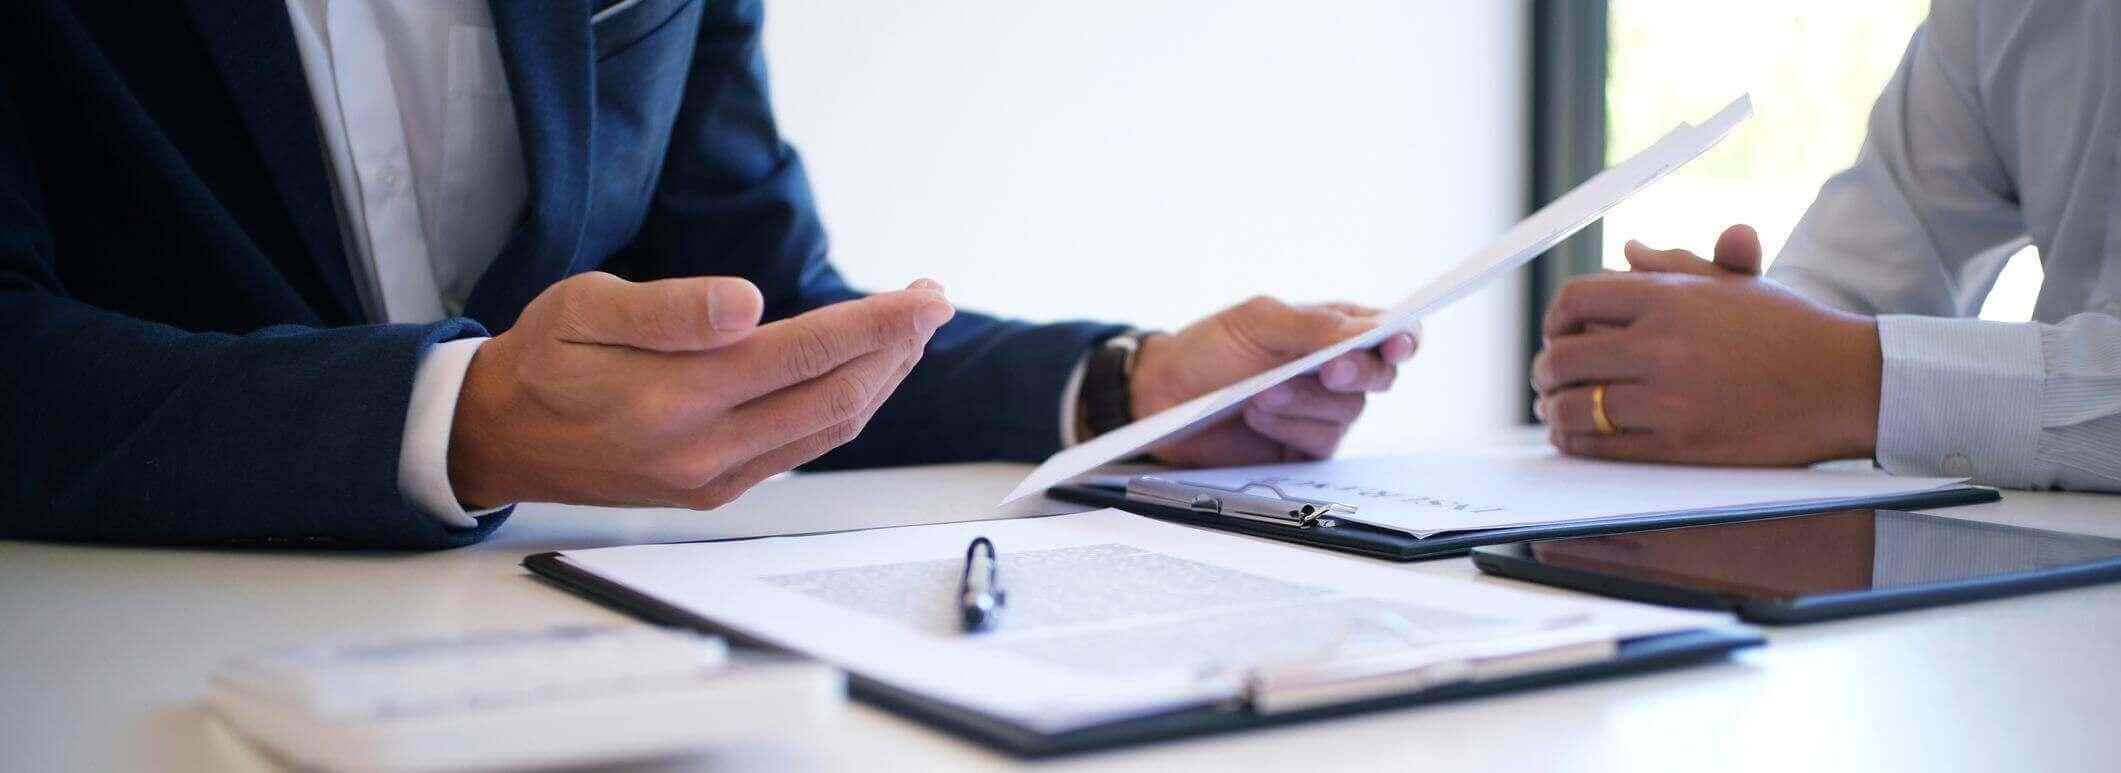 Insurance Broker explaining the factors of the hard market